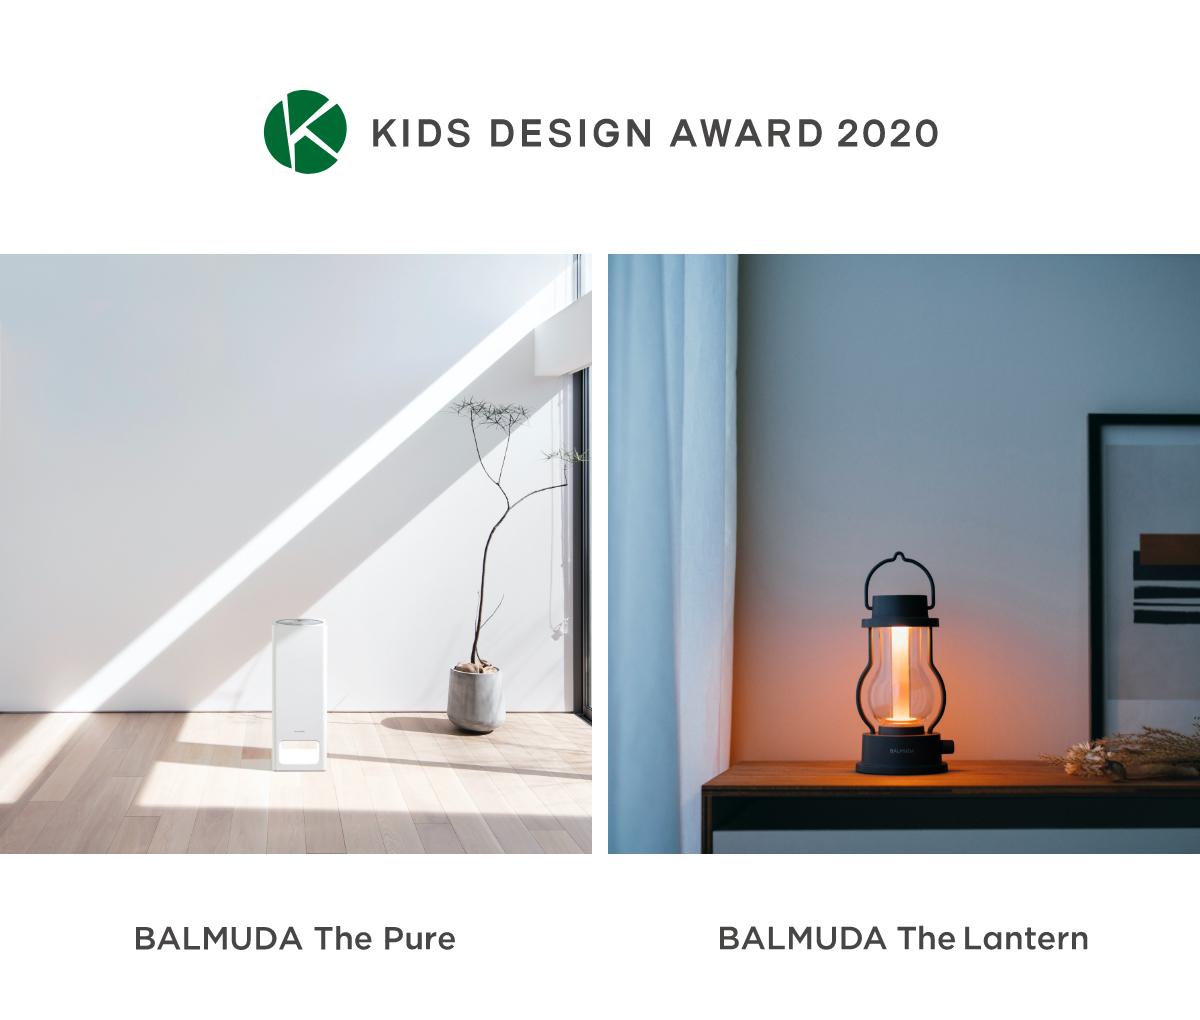 BALMUDA The PureとBALMUDA The Lanternが2020年度キッズデザイン賞を受賞